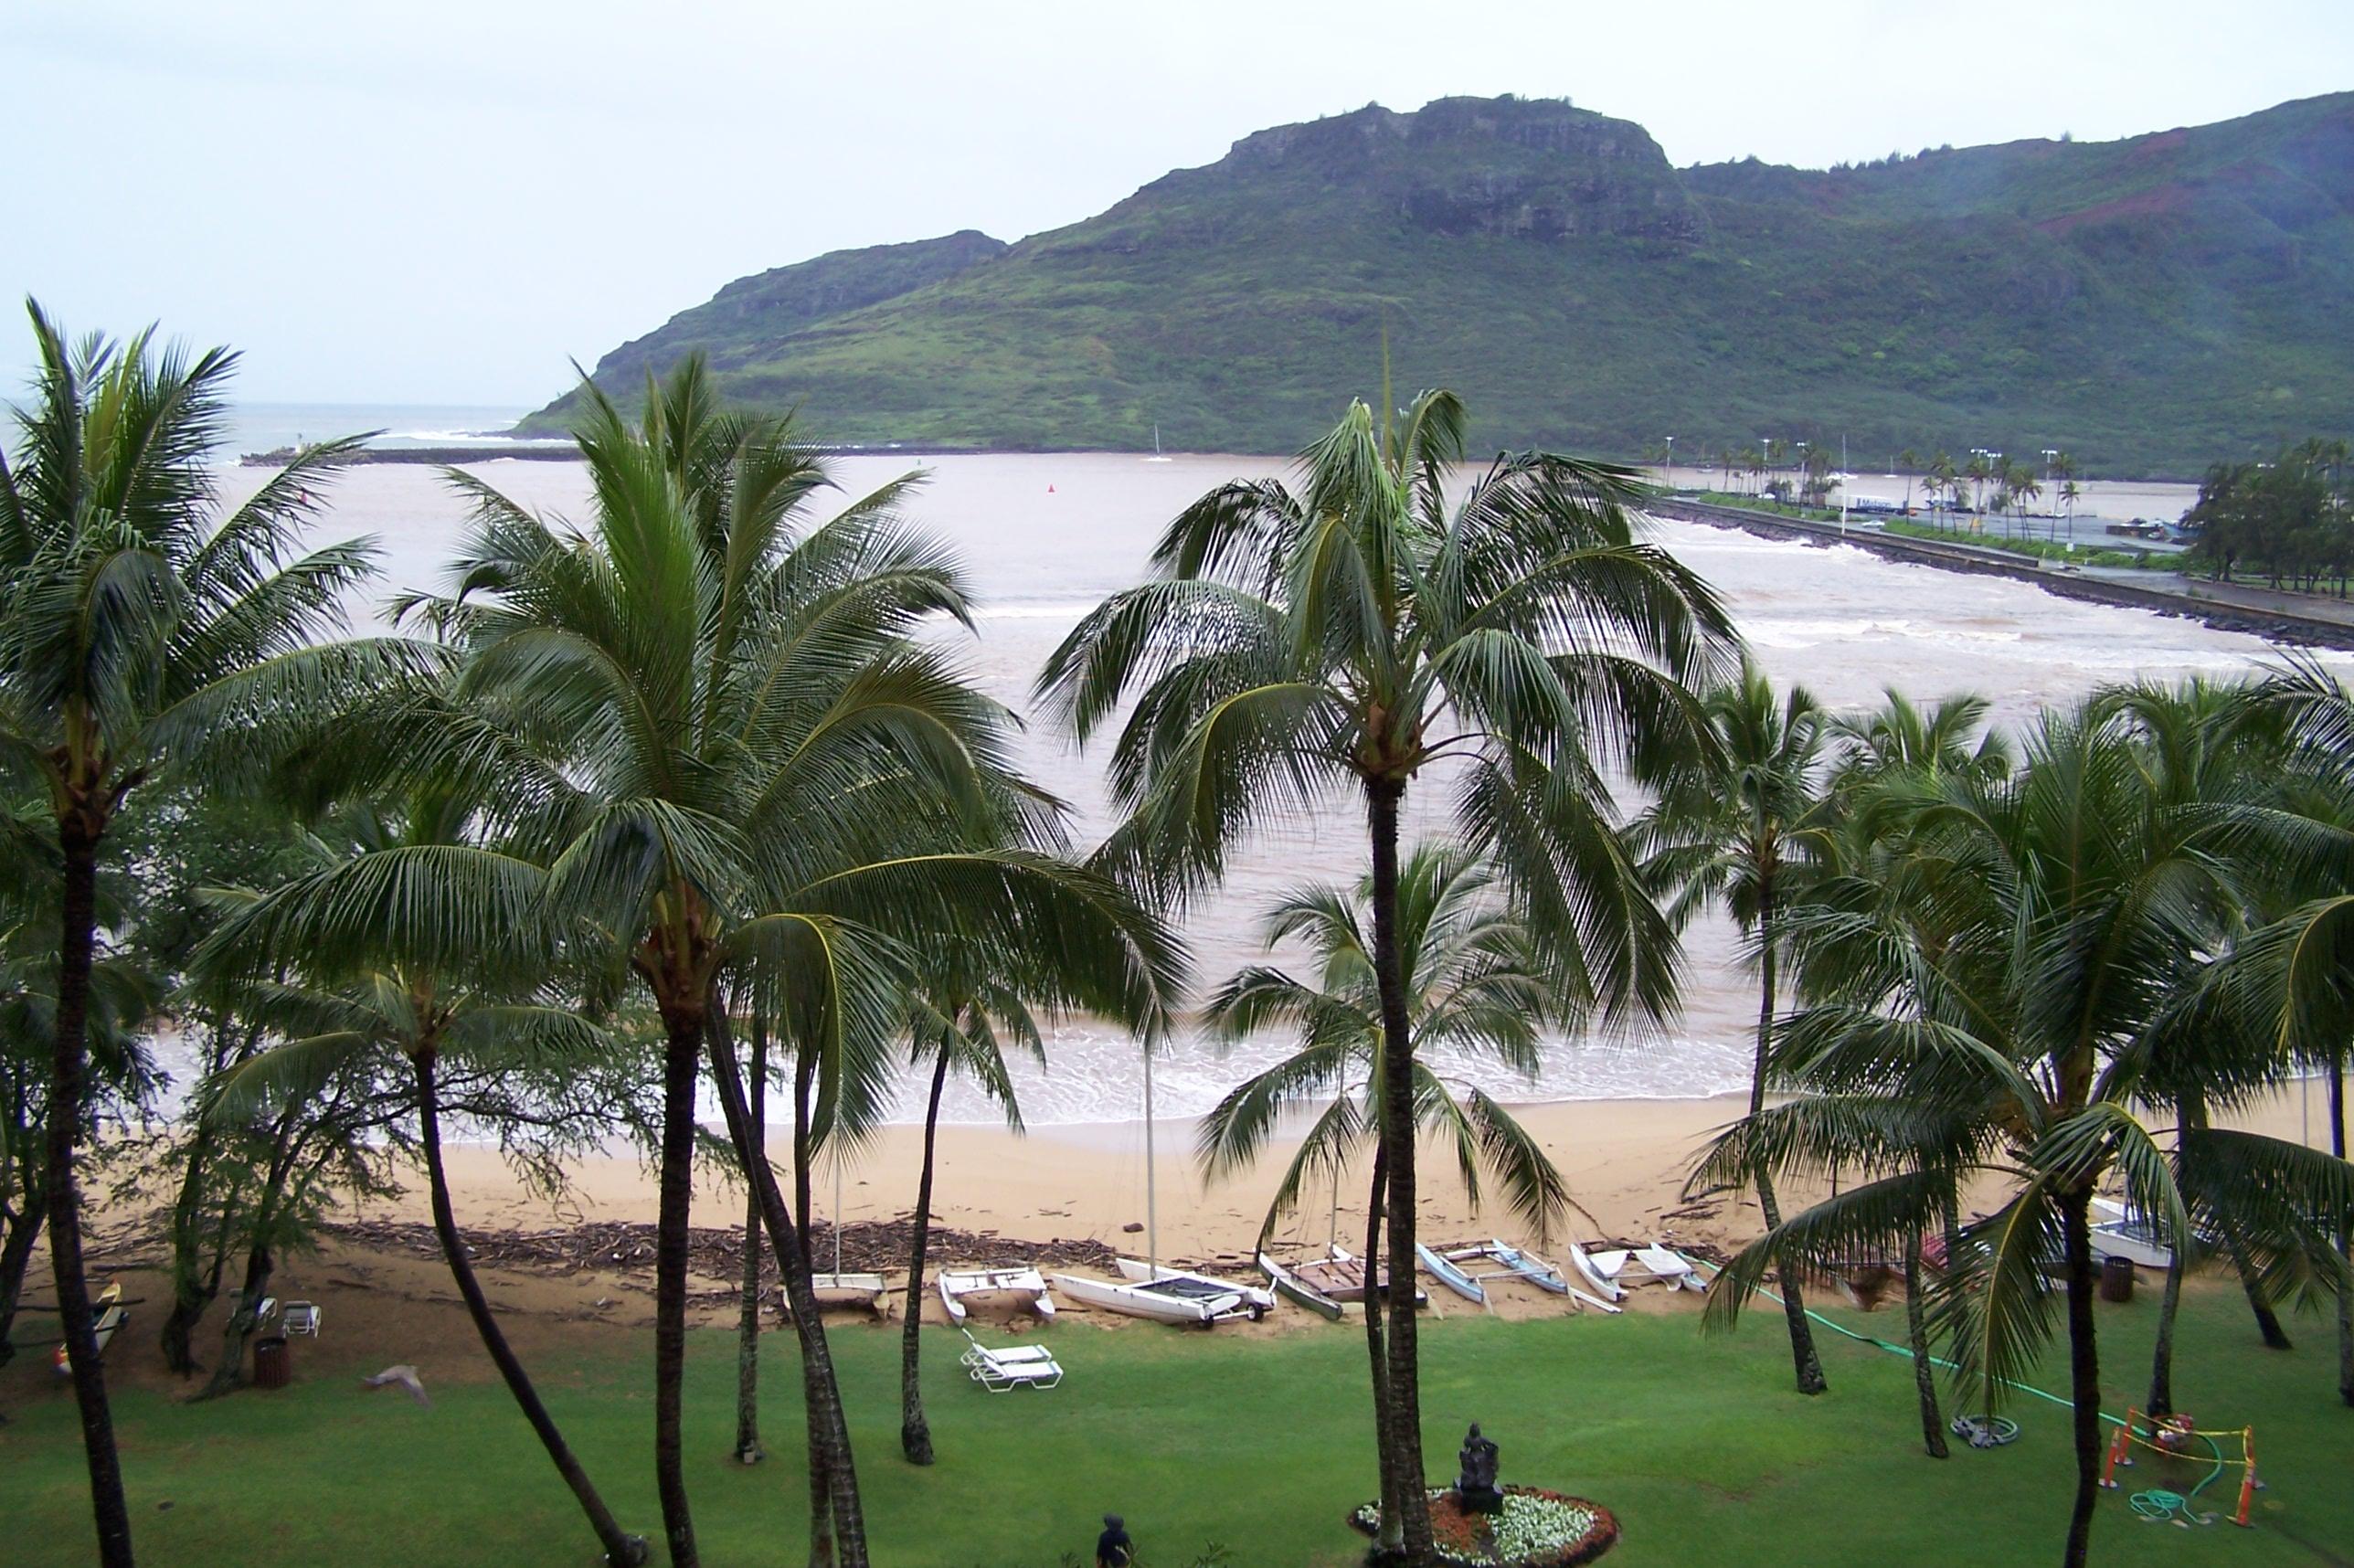 Beach after Storm, Beach, Boats, Driftwood, Palm, HQ Photo